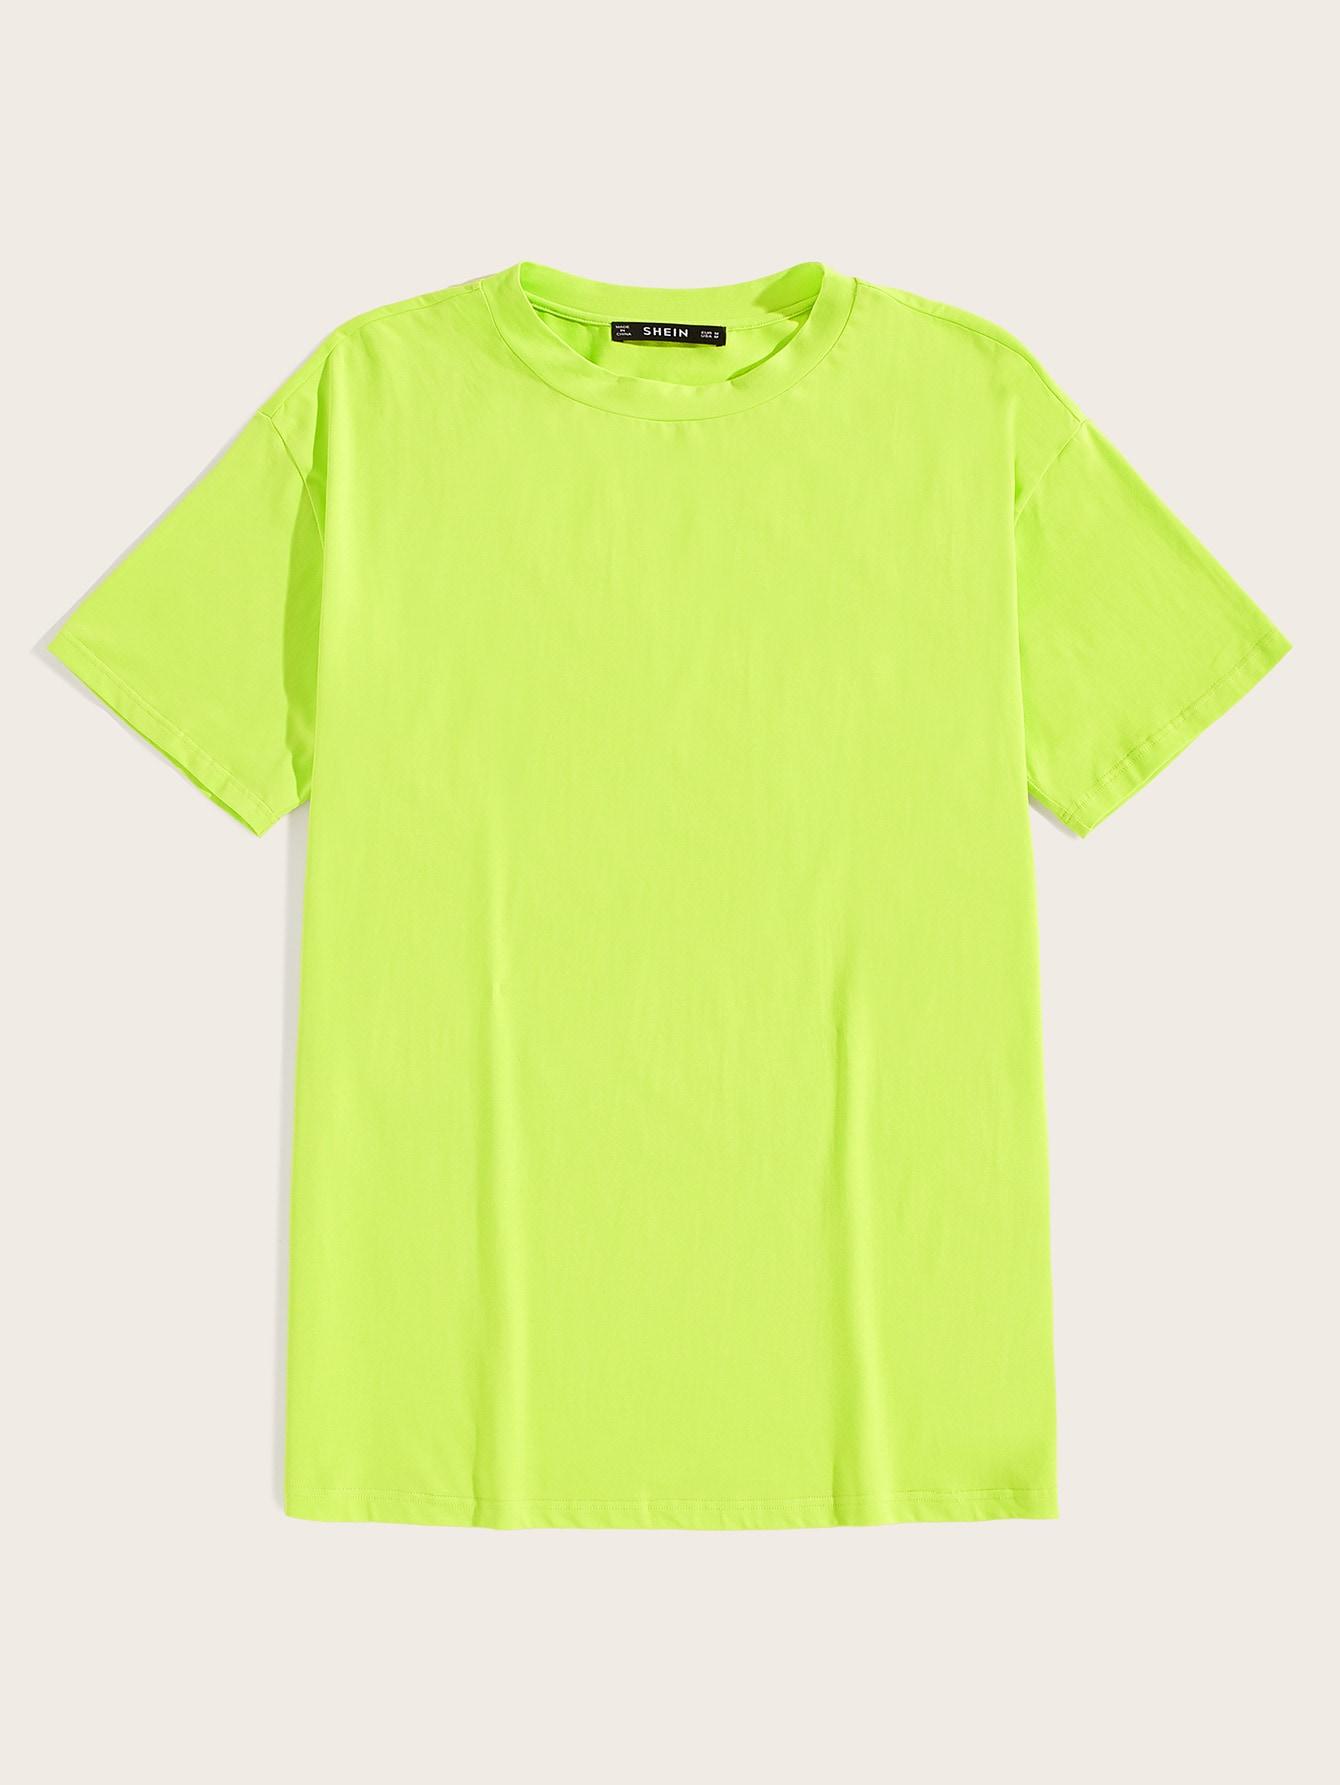 Фото - Мужская футболка цвета неонового лайма от SheIn цвет зелёный